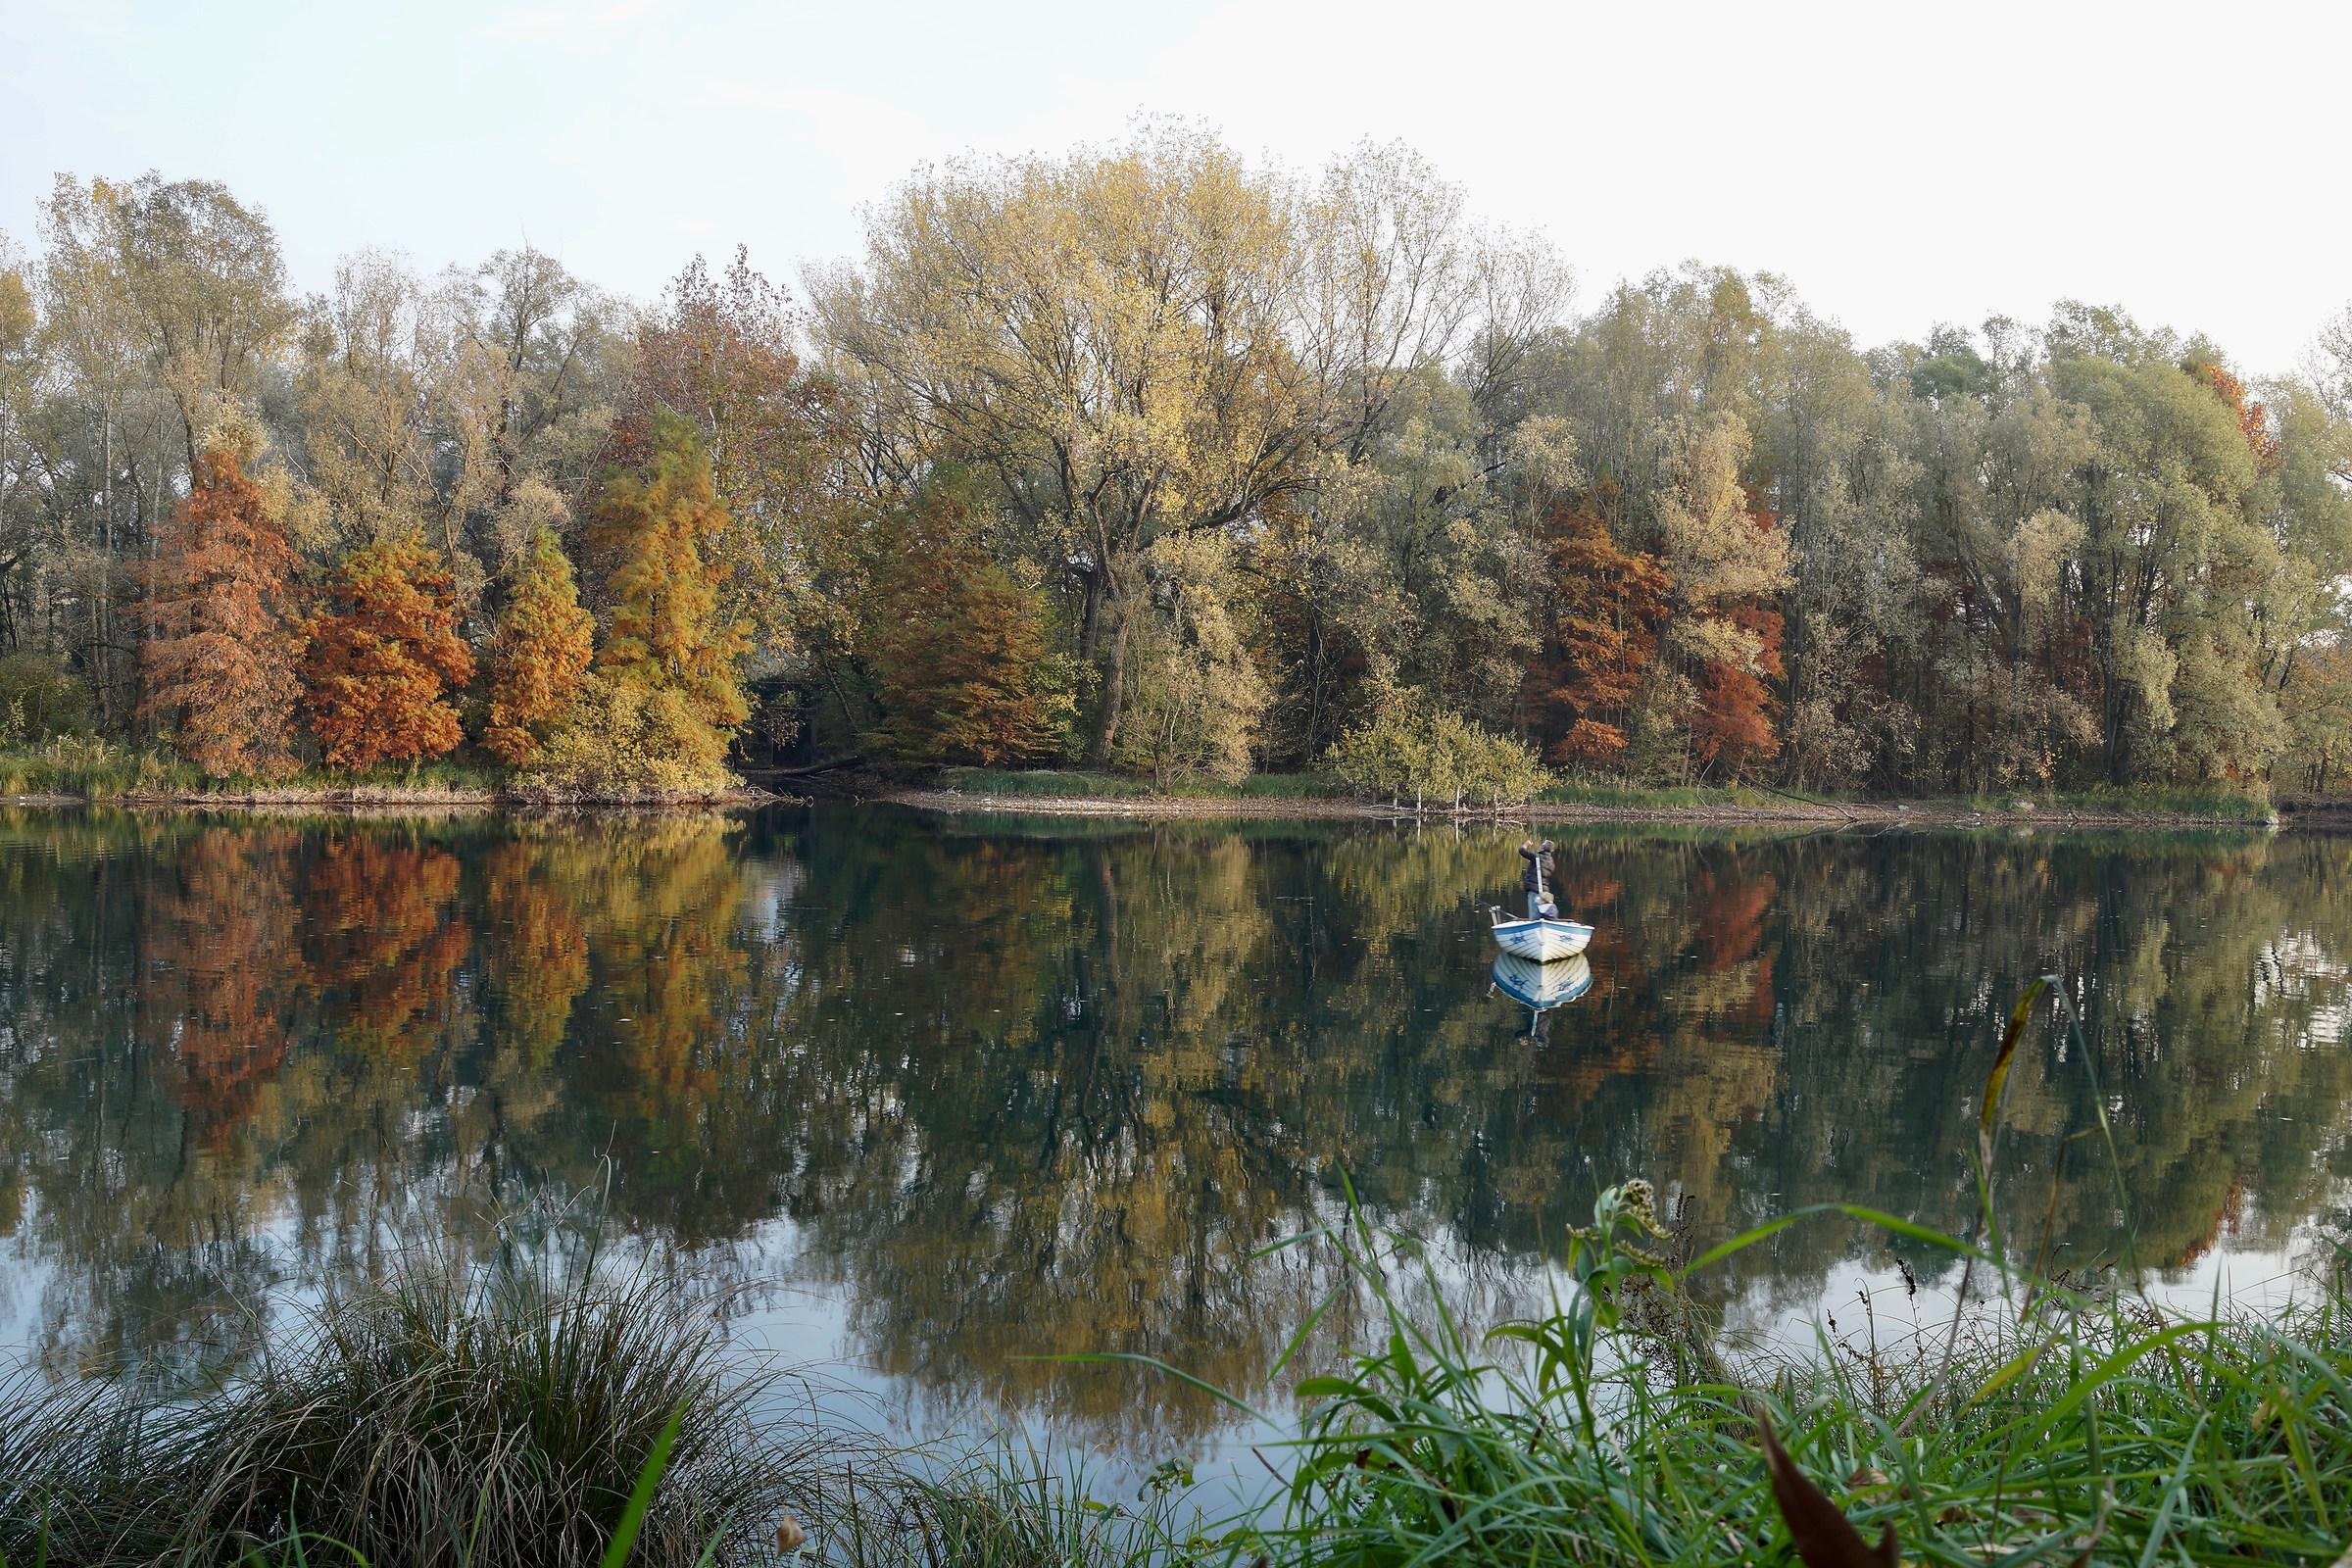 autumn fishing along the river...